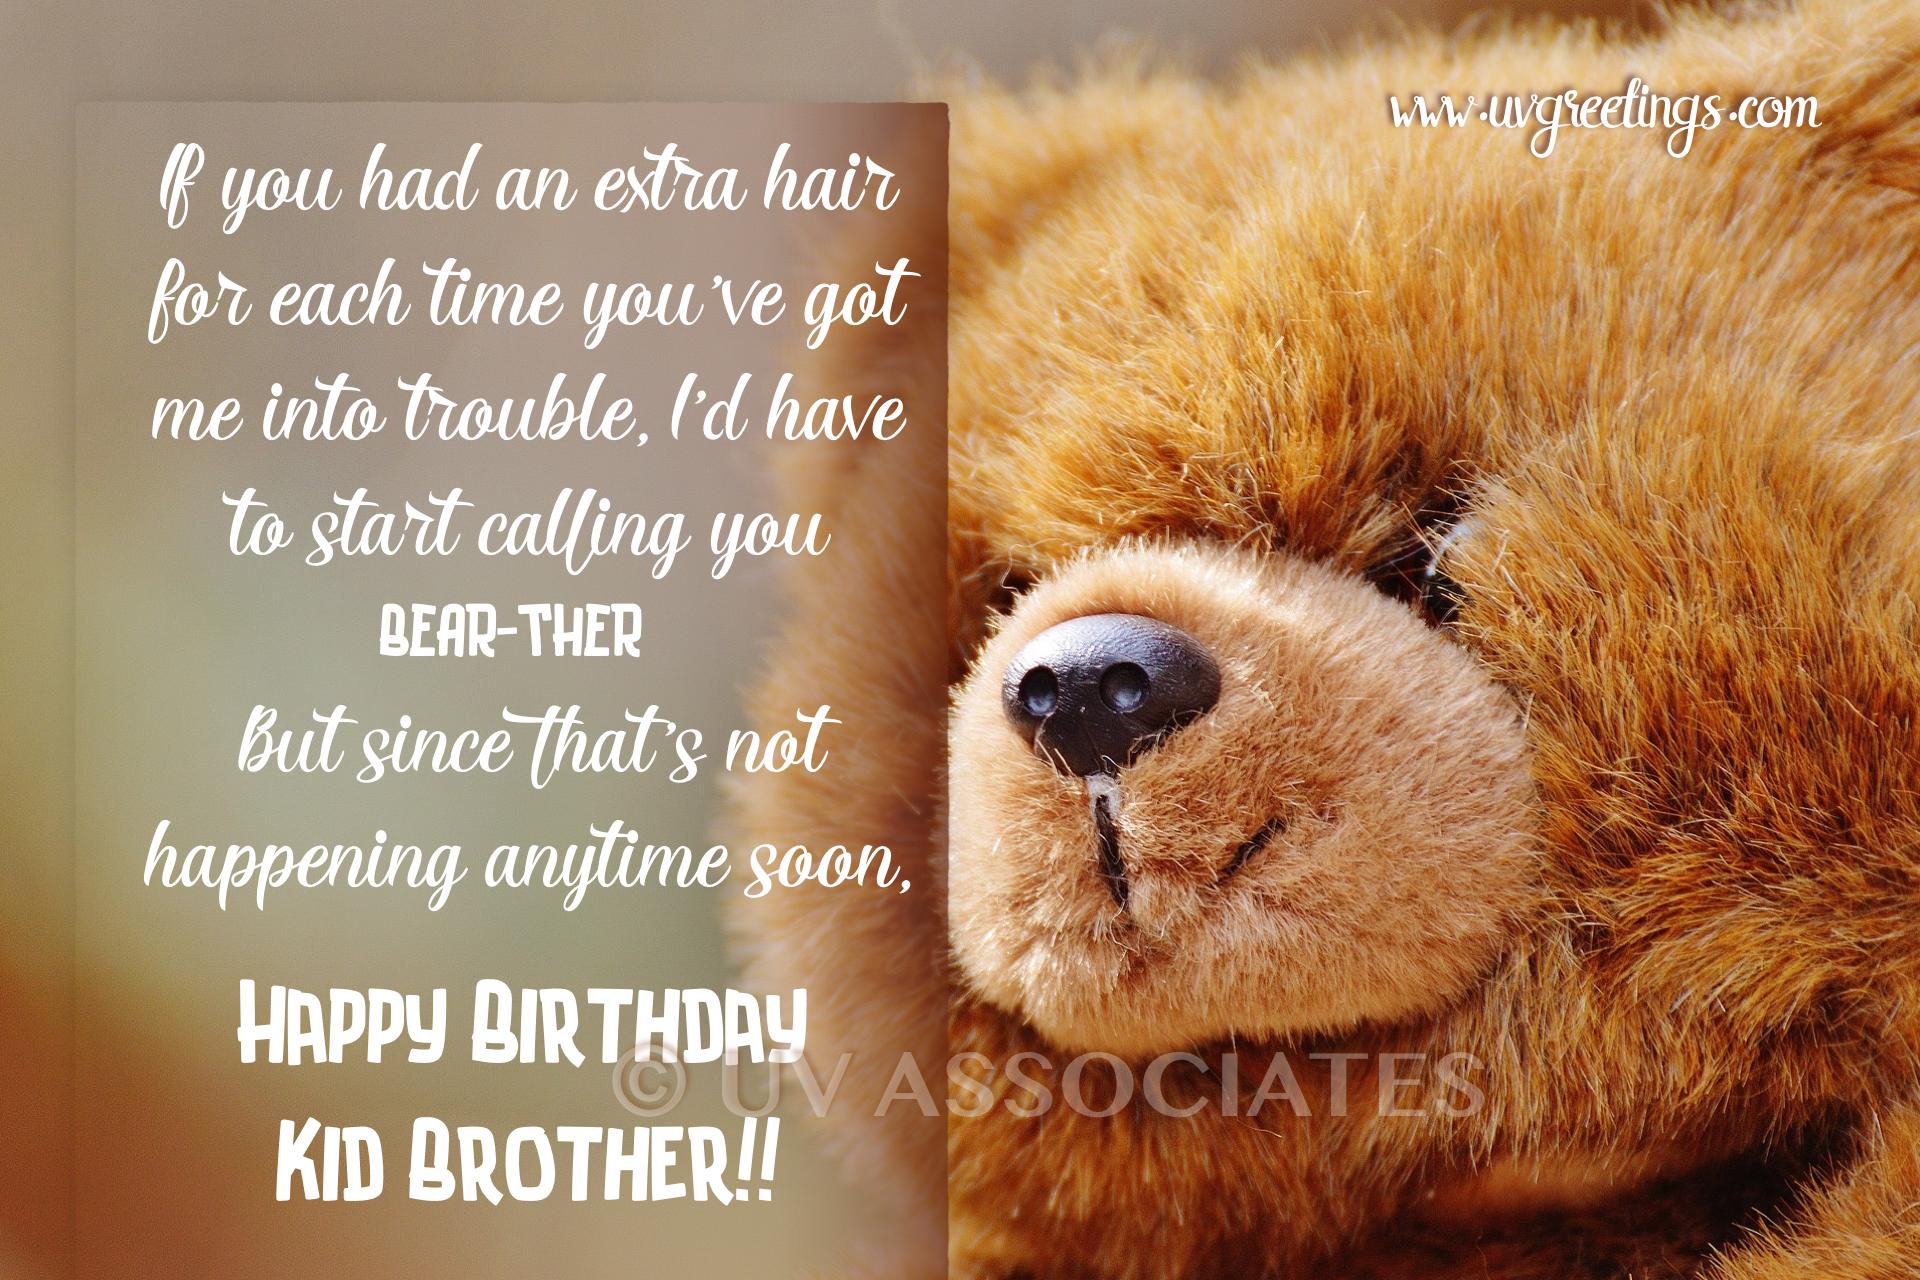 Funny Birthday eCard Happy Birthday Bear ther Brother